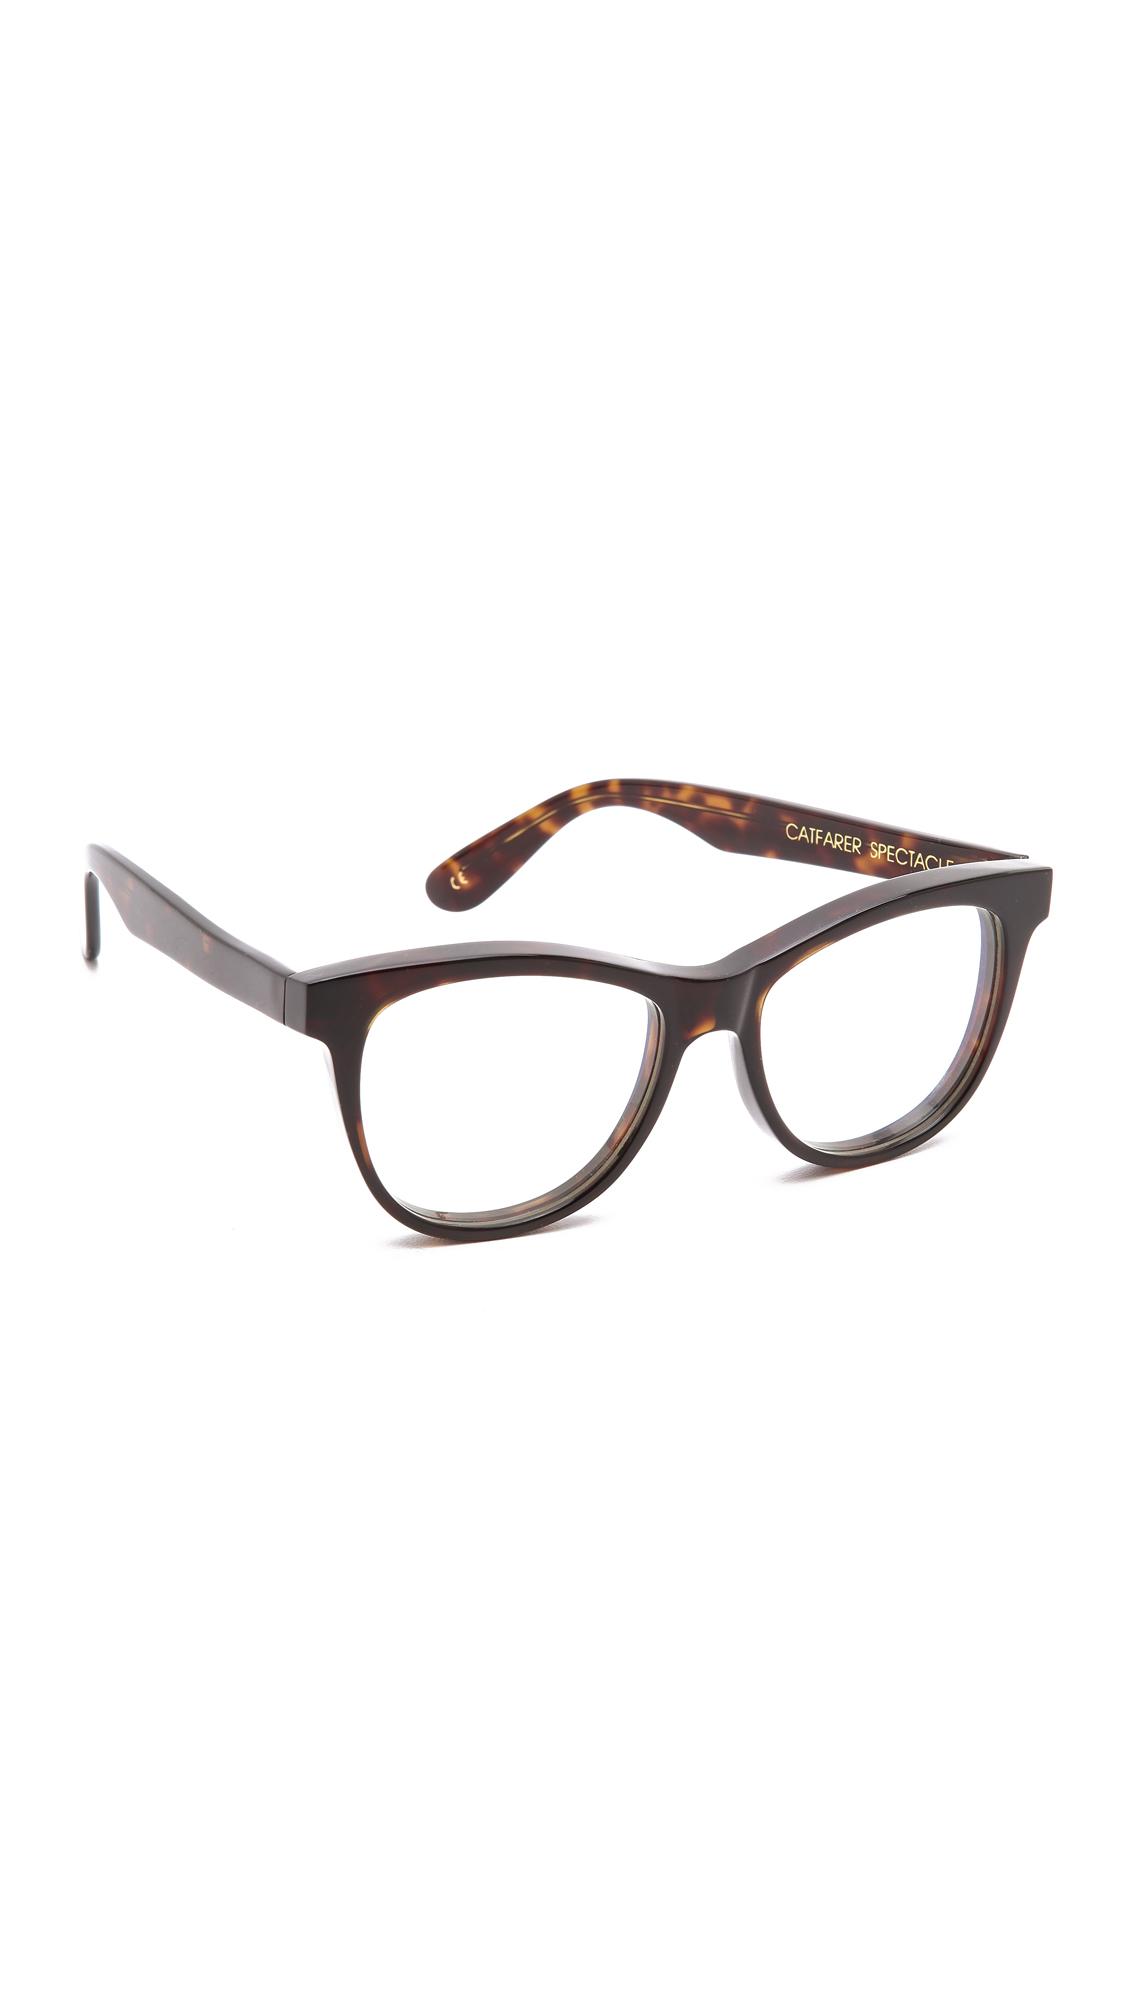 Wayfarer Sunglasses For Women - Macy's